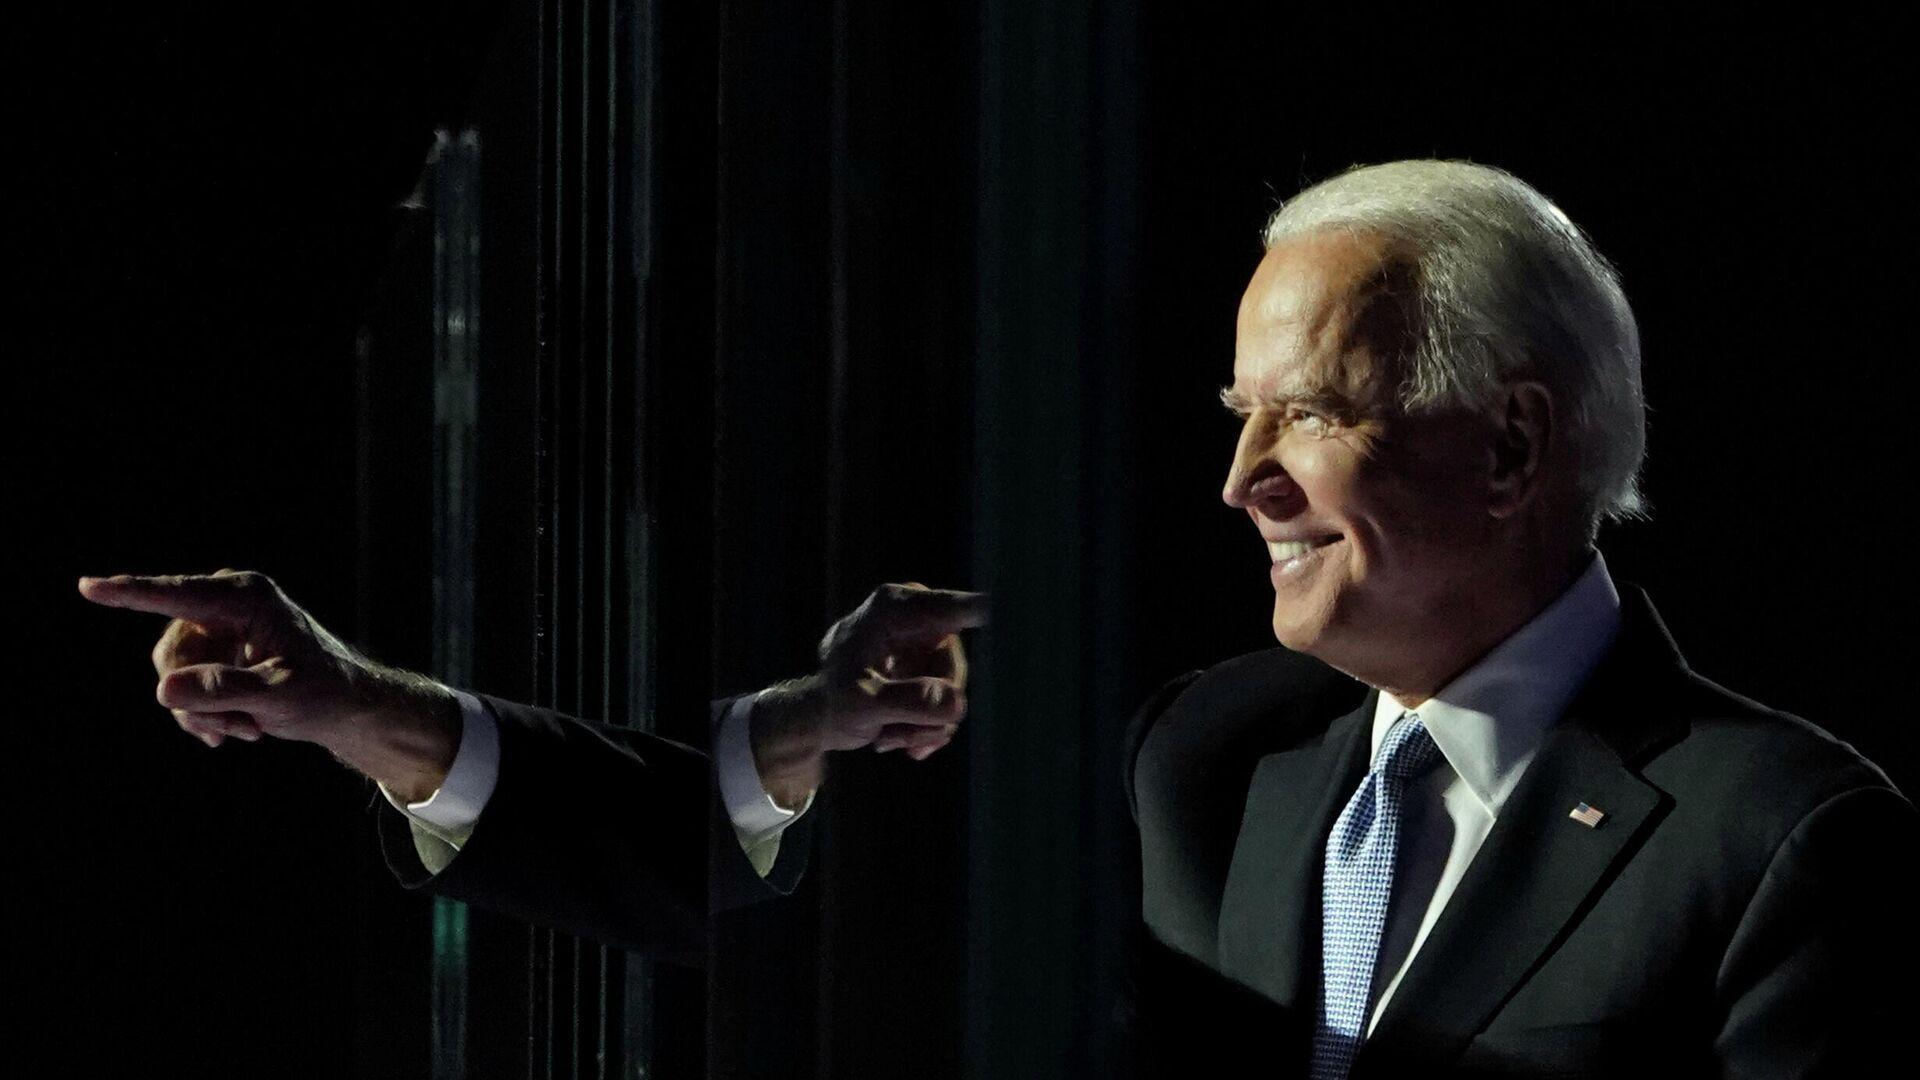 В Realclearpolitics опровергли «кражу голосов» у Байдена